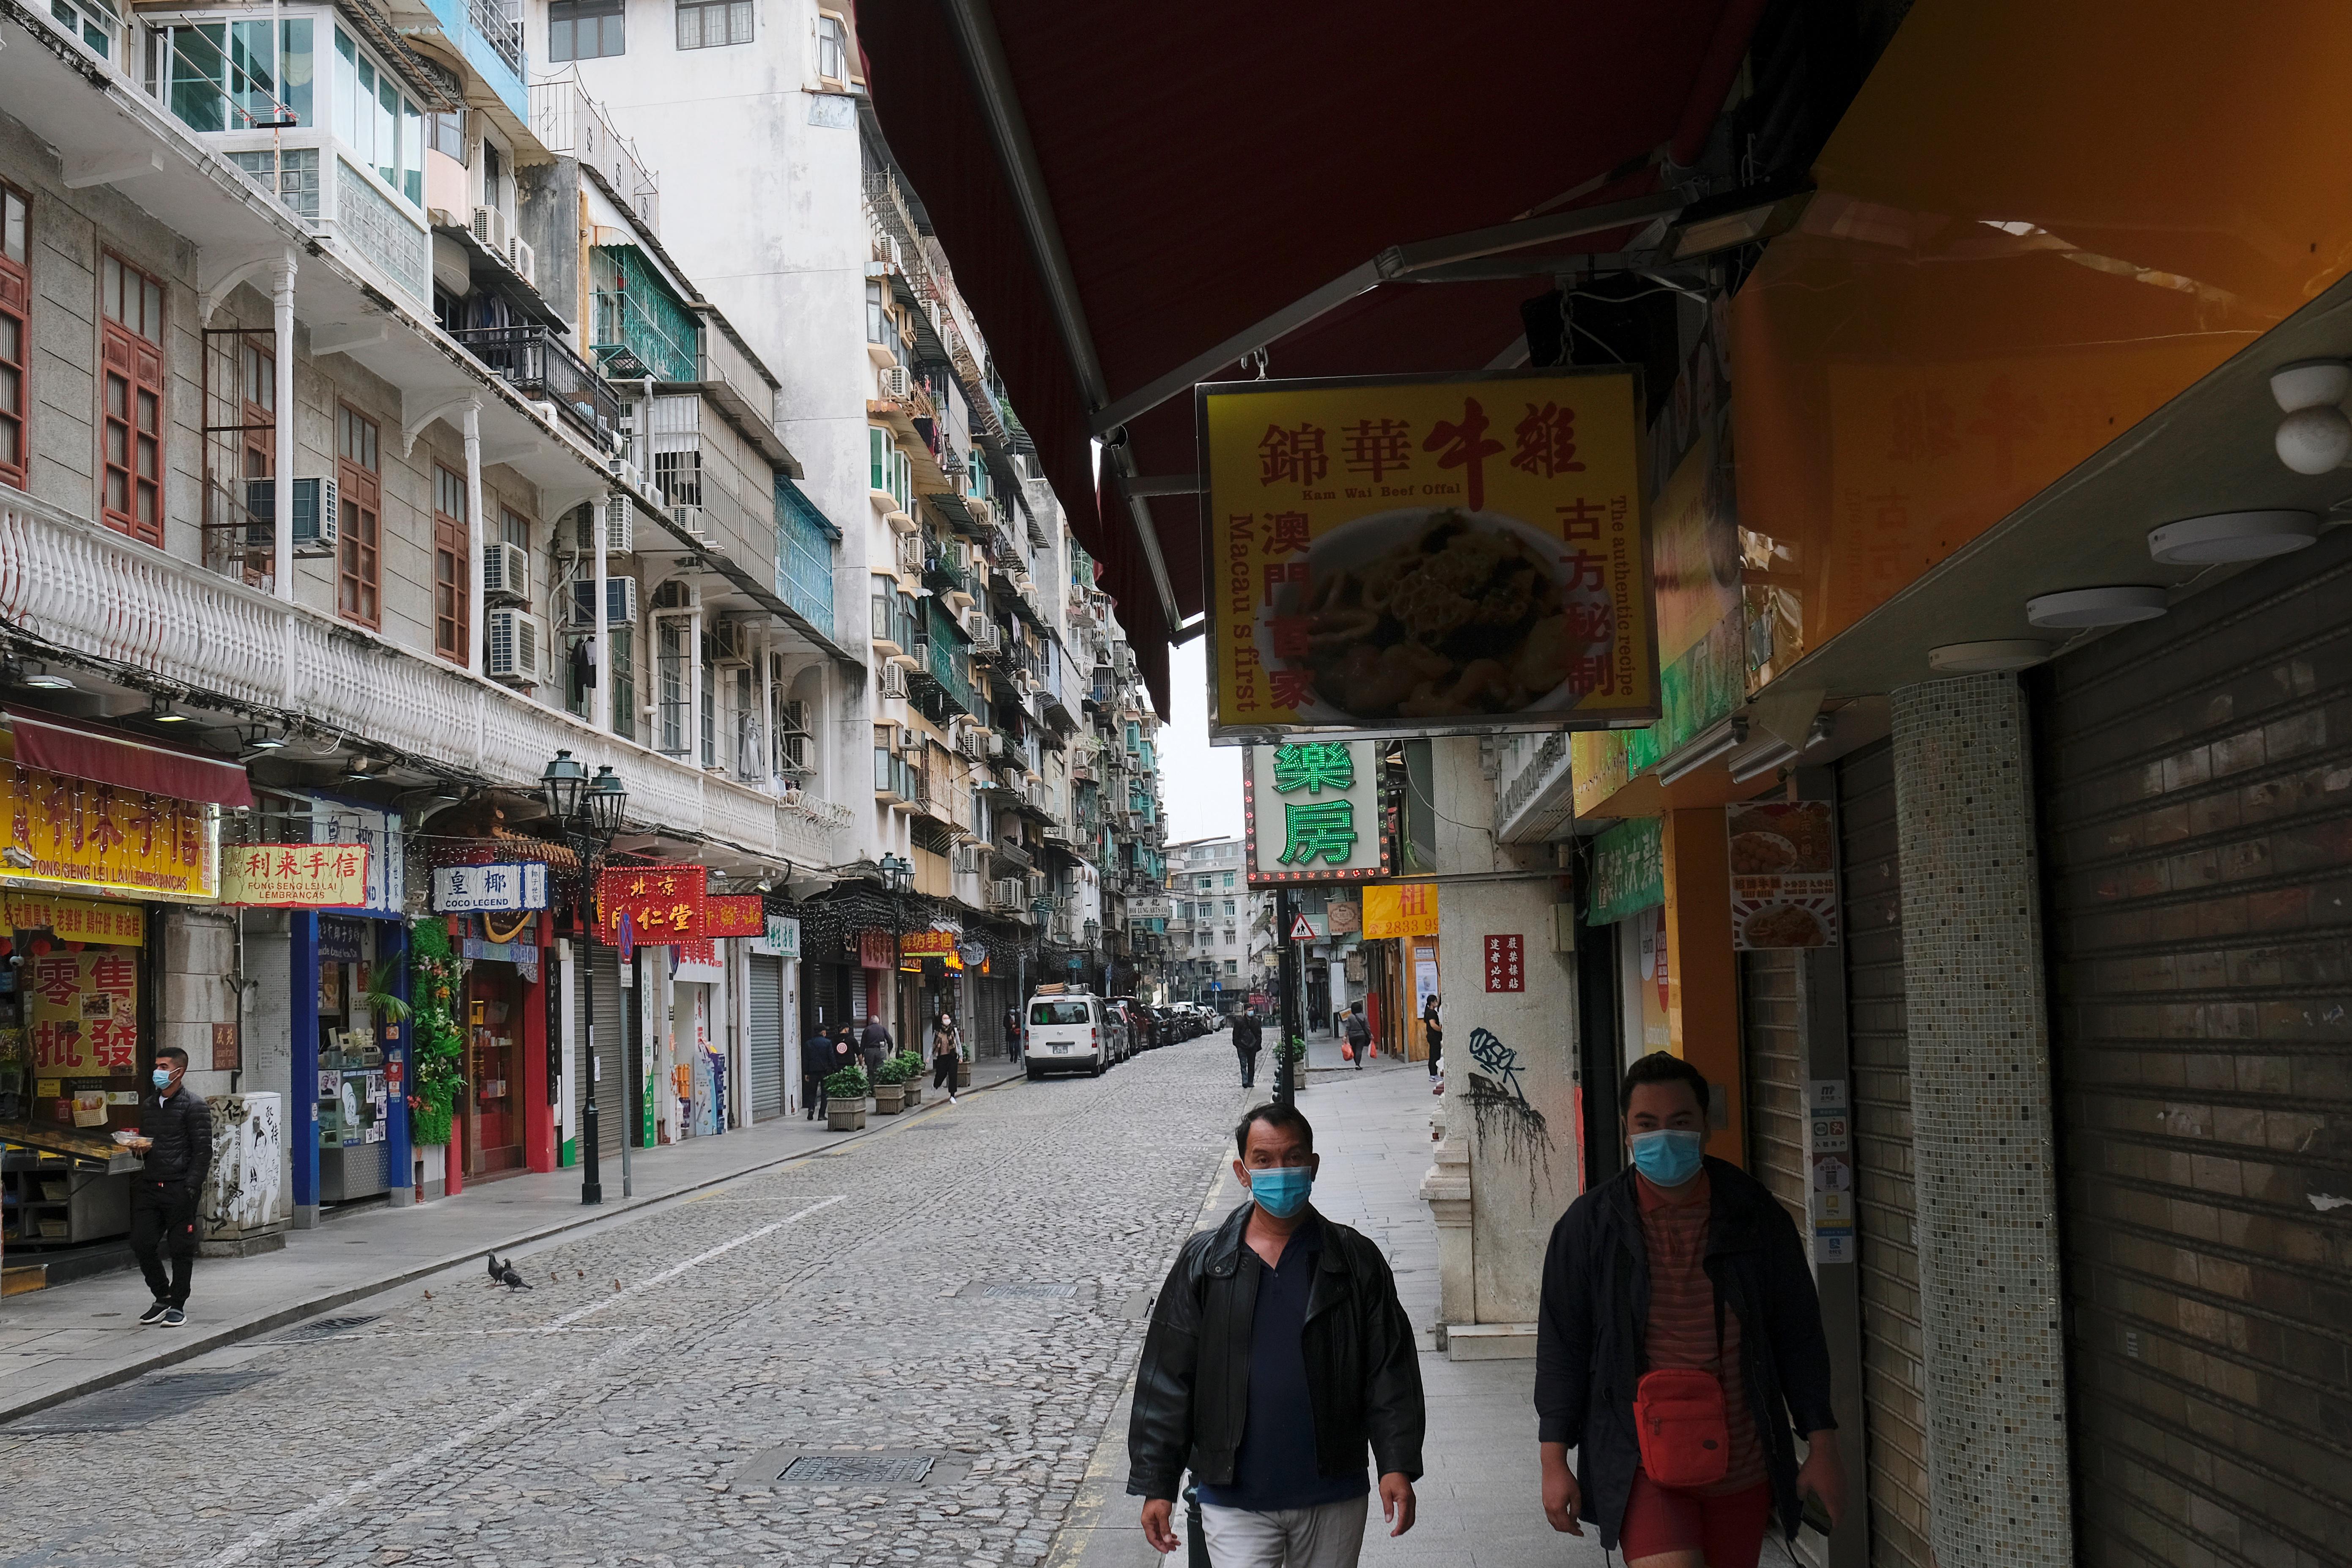 People wear masks as they walk near Ruins of St. Paul's, following the coronavirus outbreak in Macau, China February 5, 2020. REUTERS/Tyrone Siu